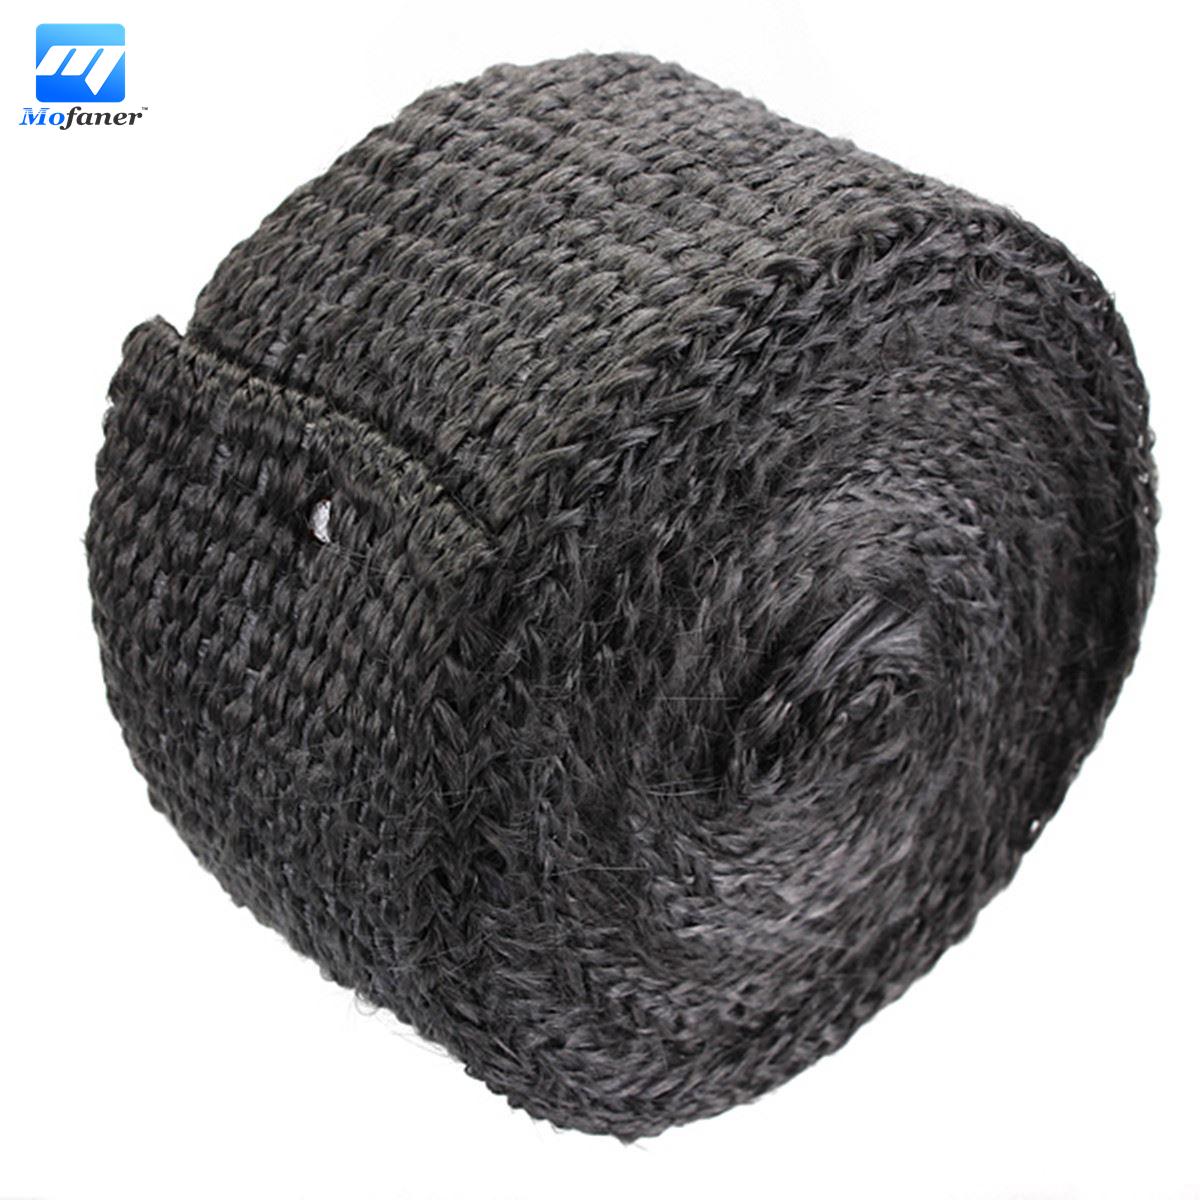 4.5m x 4.5cm x 2mm Car Motorcycle Exhaust Heat Pipe Header Wrap Manifold Fiberglass Insulating Black